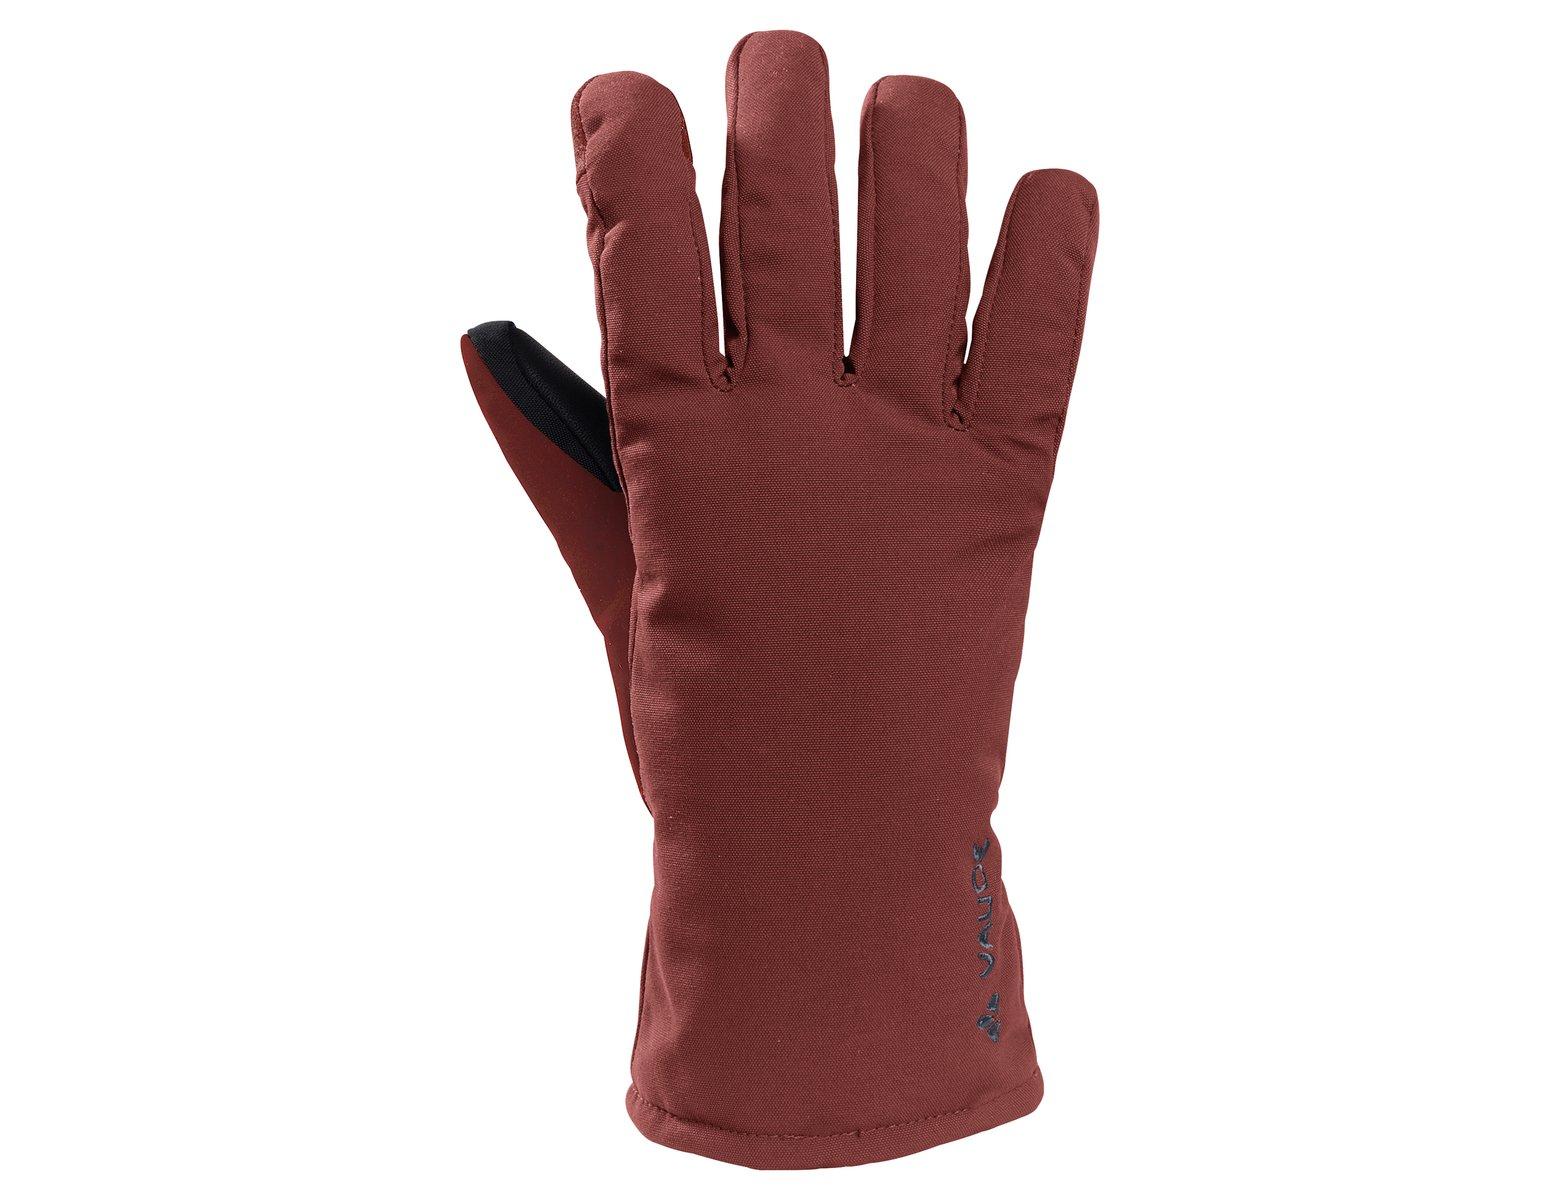 719jYz%2B8drL - Vaude Manukau Gloves